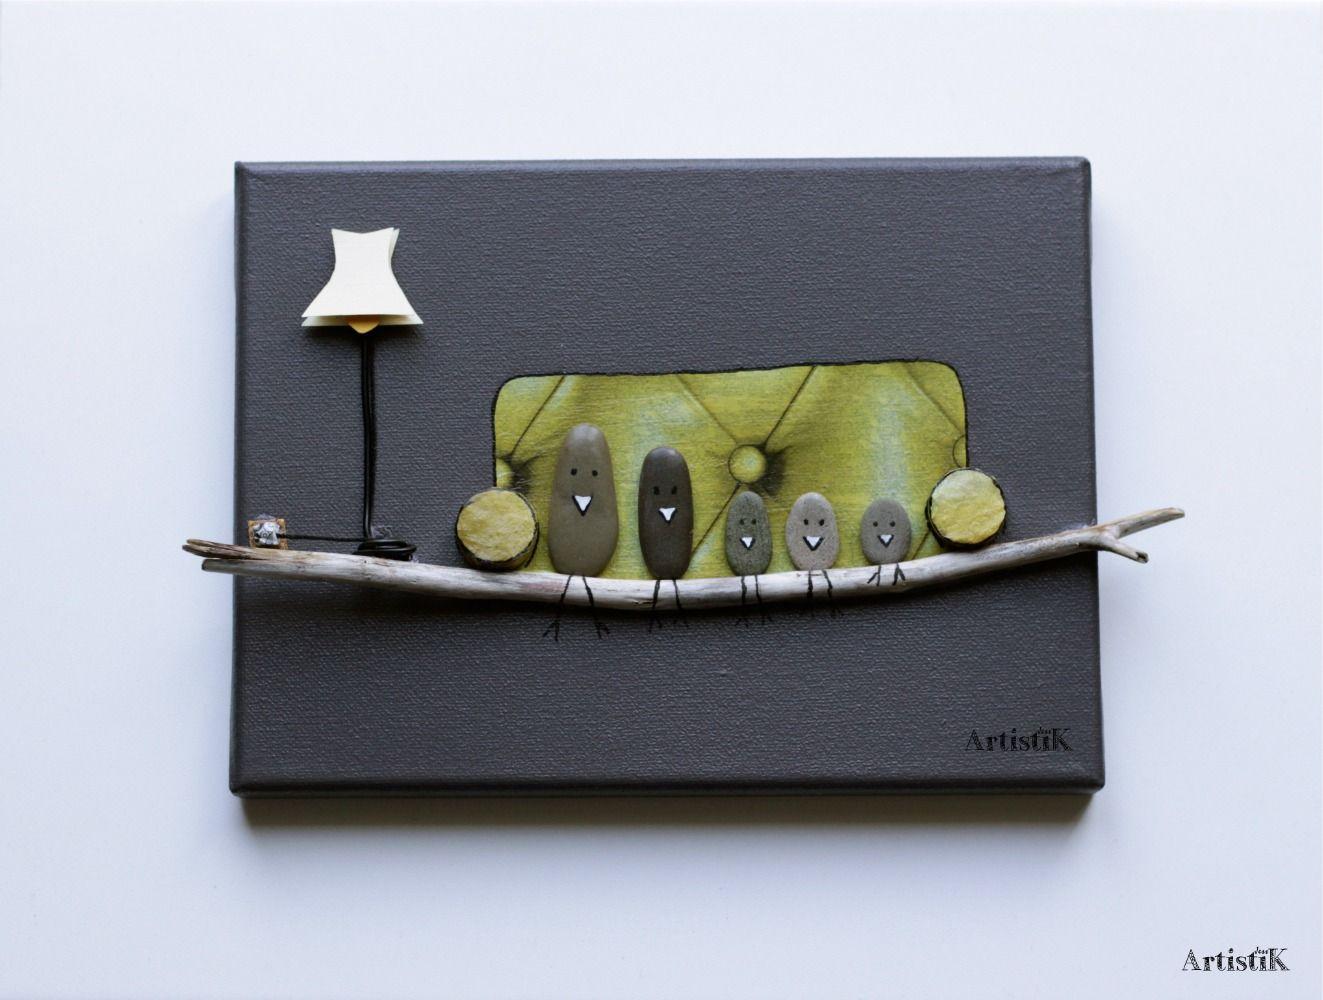 tableau galets bois flott oiseaux canap jaune fond anthracite famille dessin humoristique. Black Bedroom Furniture Sets. Home Design Ideas